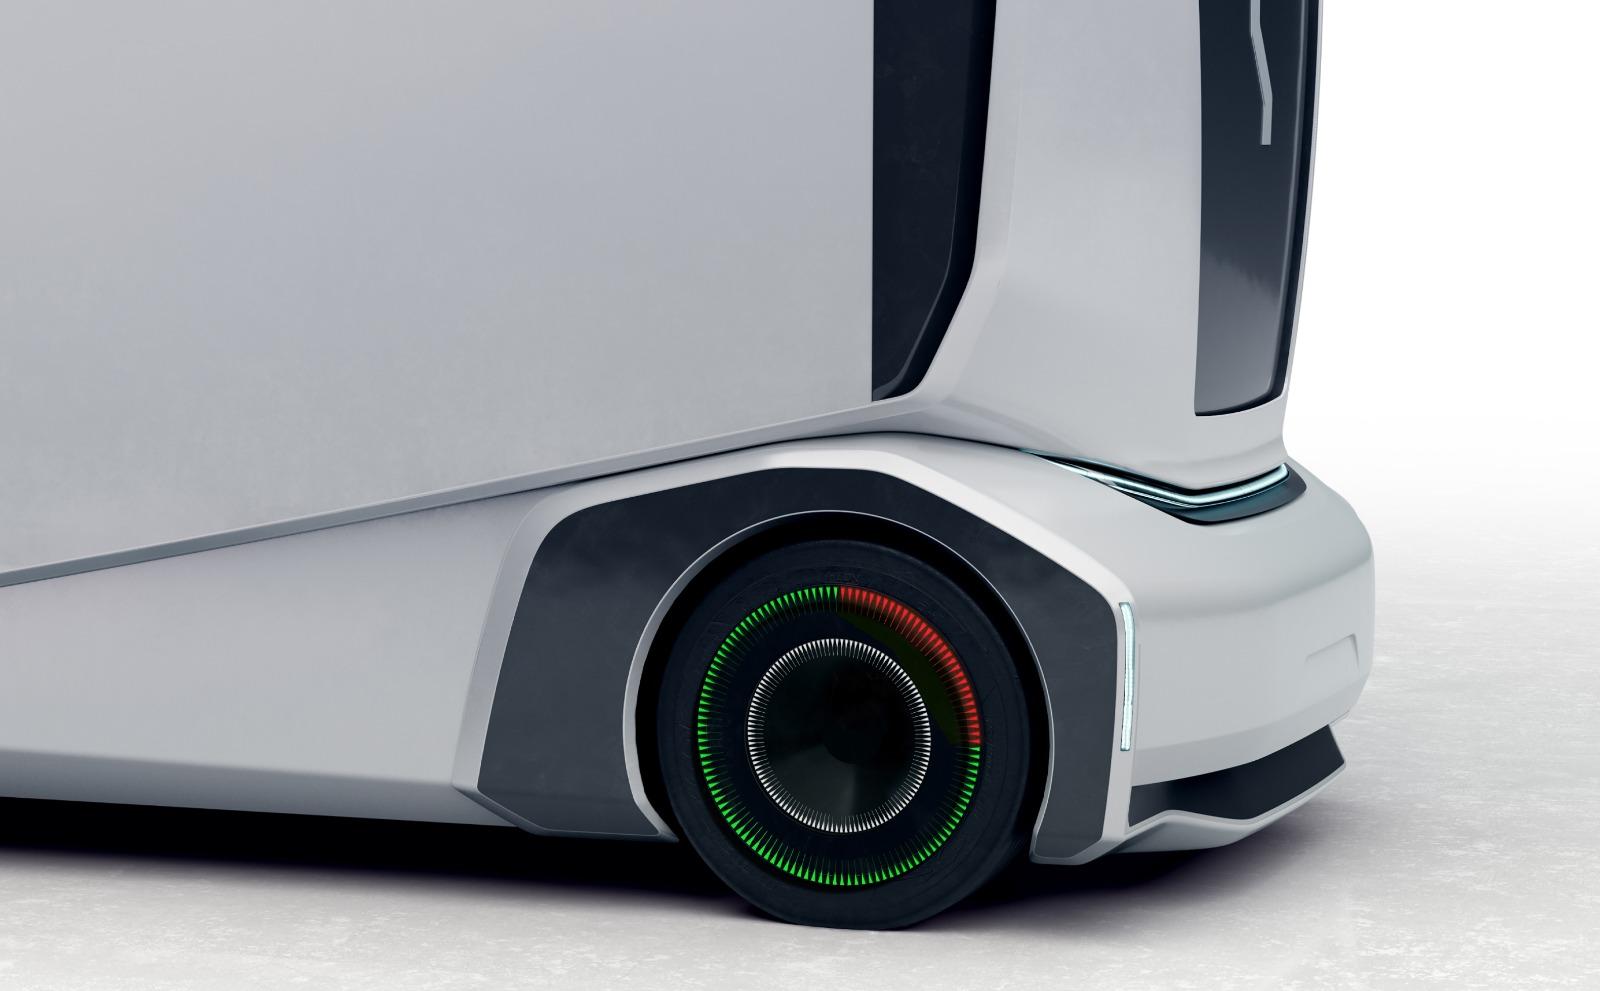 Bridgestone, Einride Work Together on Electric, Autonomous Trucks